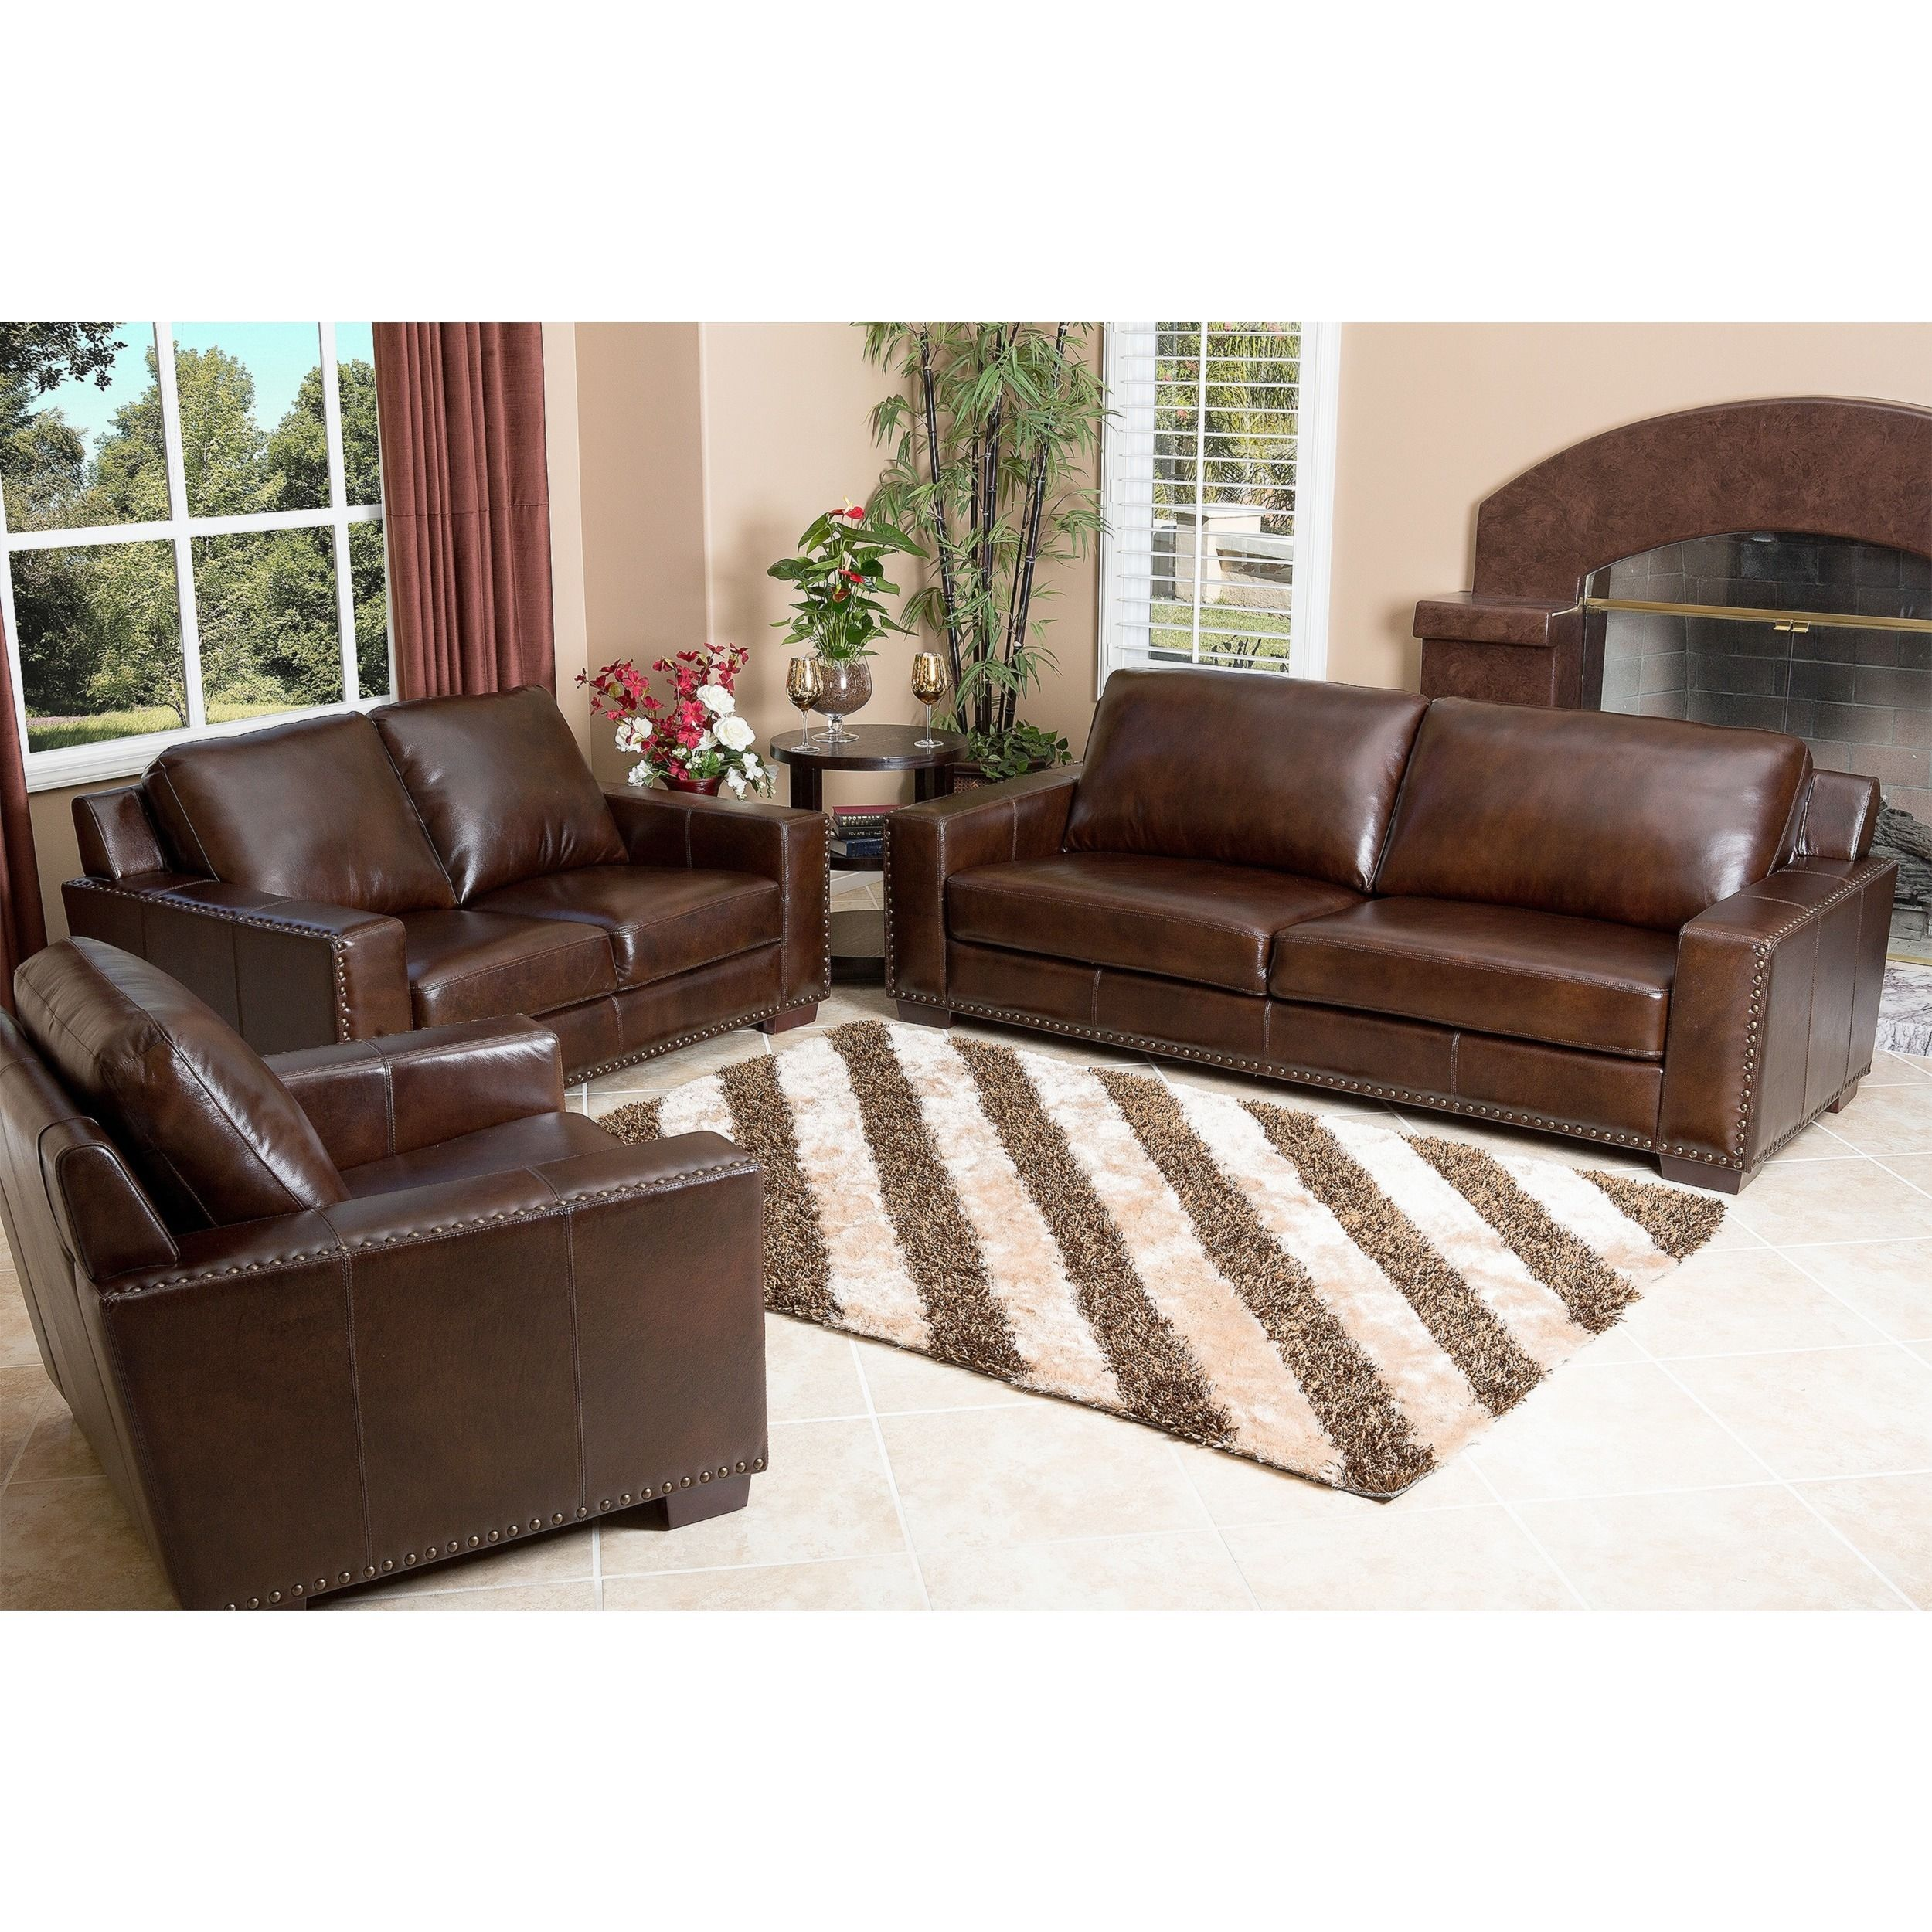 Abbyson Barrington Top Grain Leather 3 Piece Living Room Set With Images Top Grain Leather Sofa Leather Sofa Set Abbyson Living